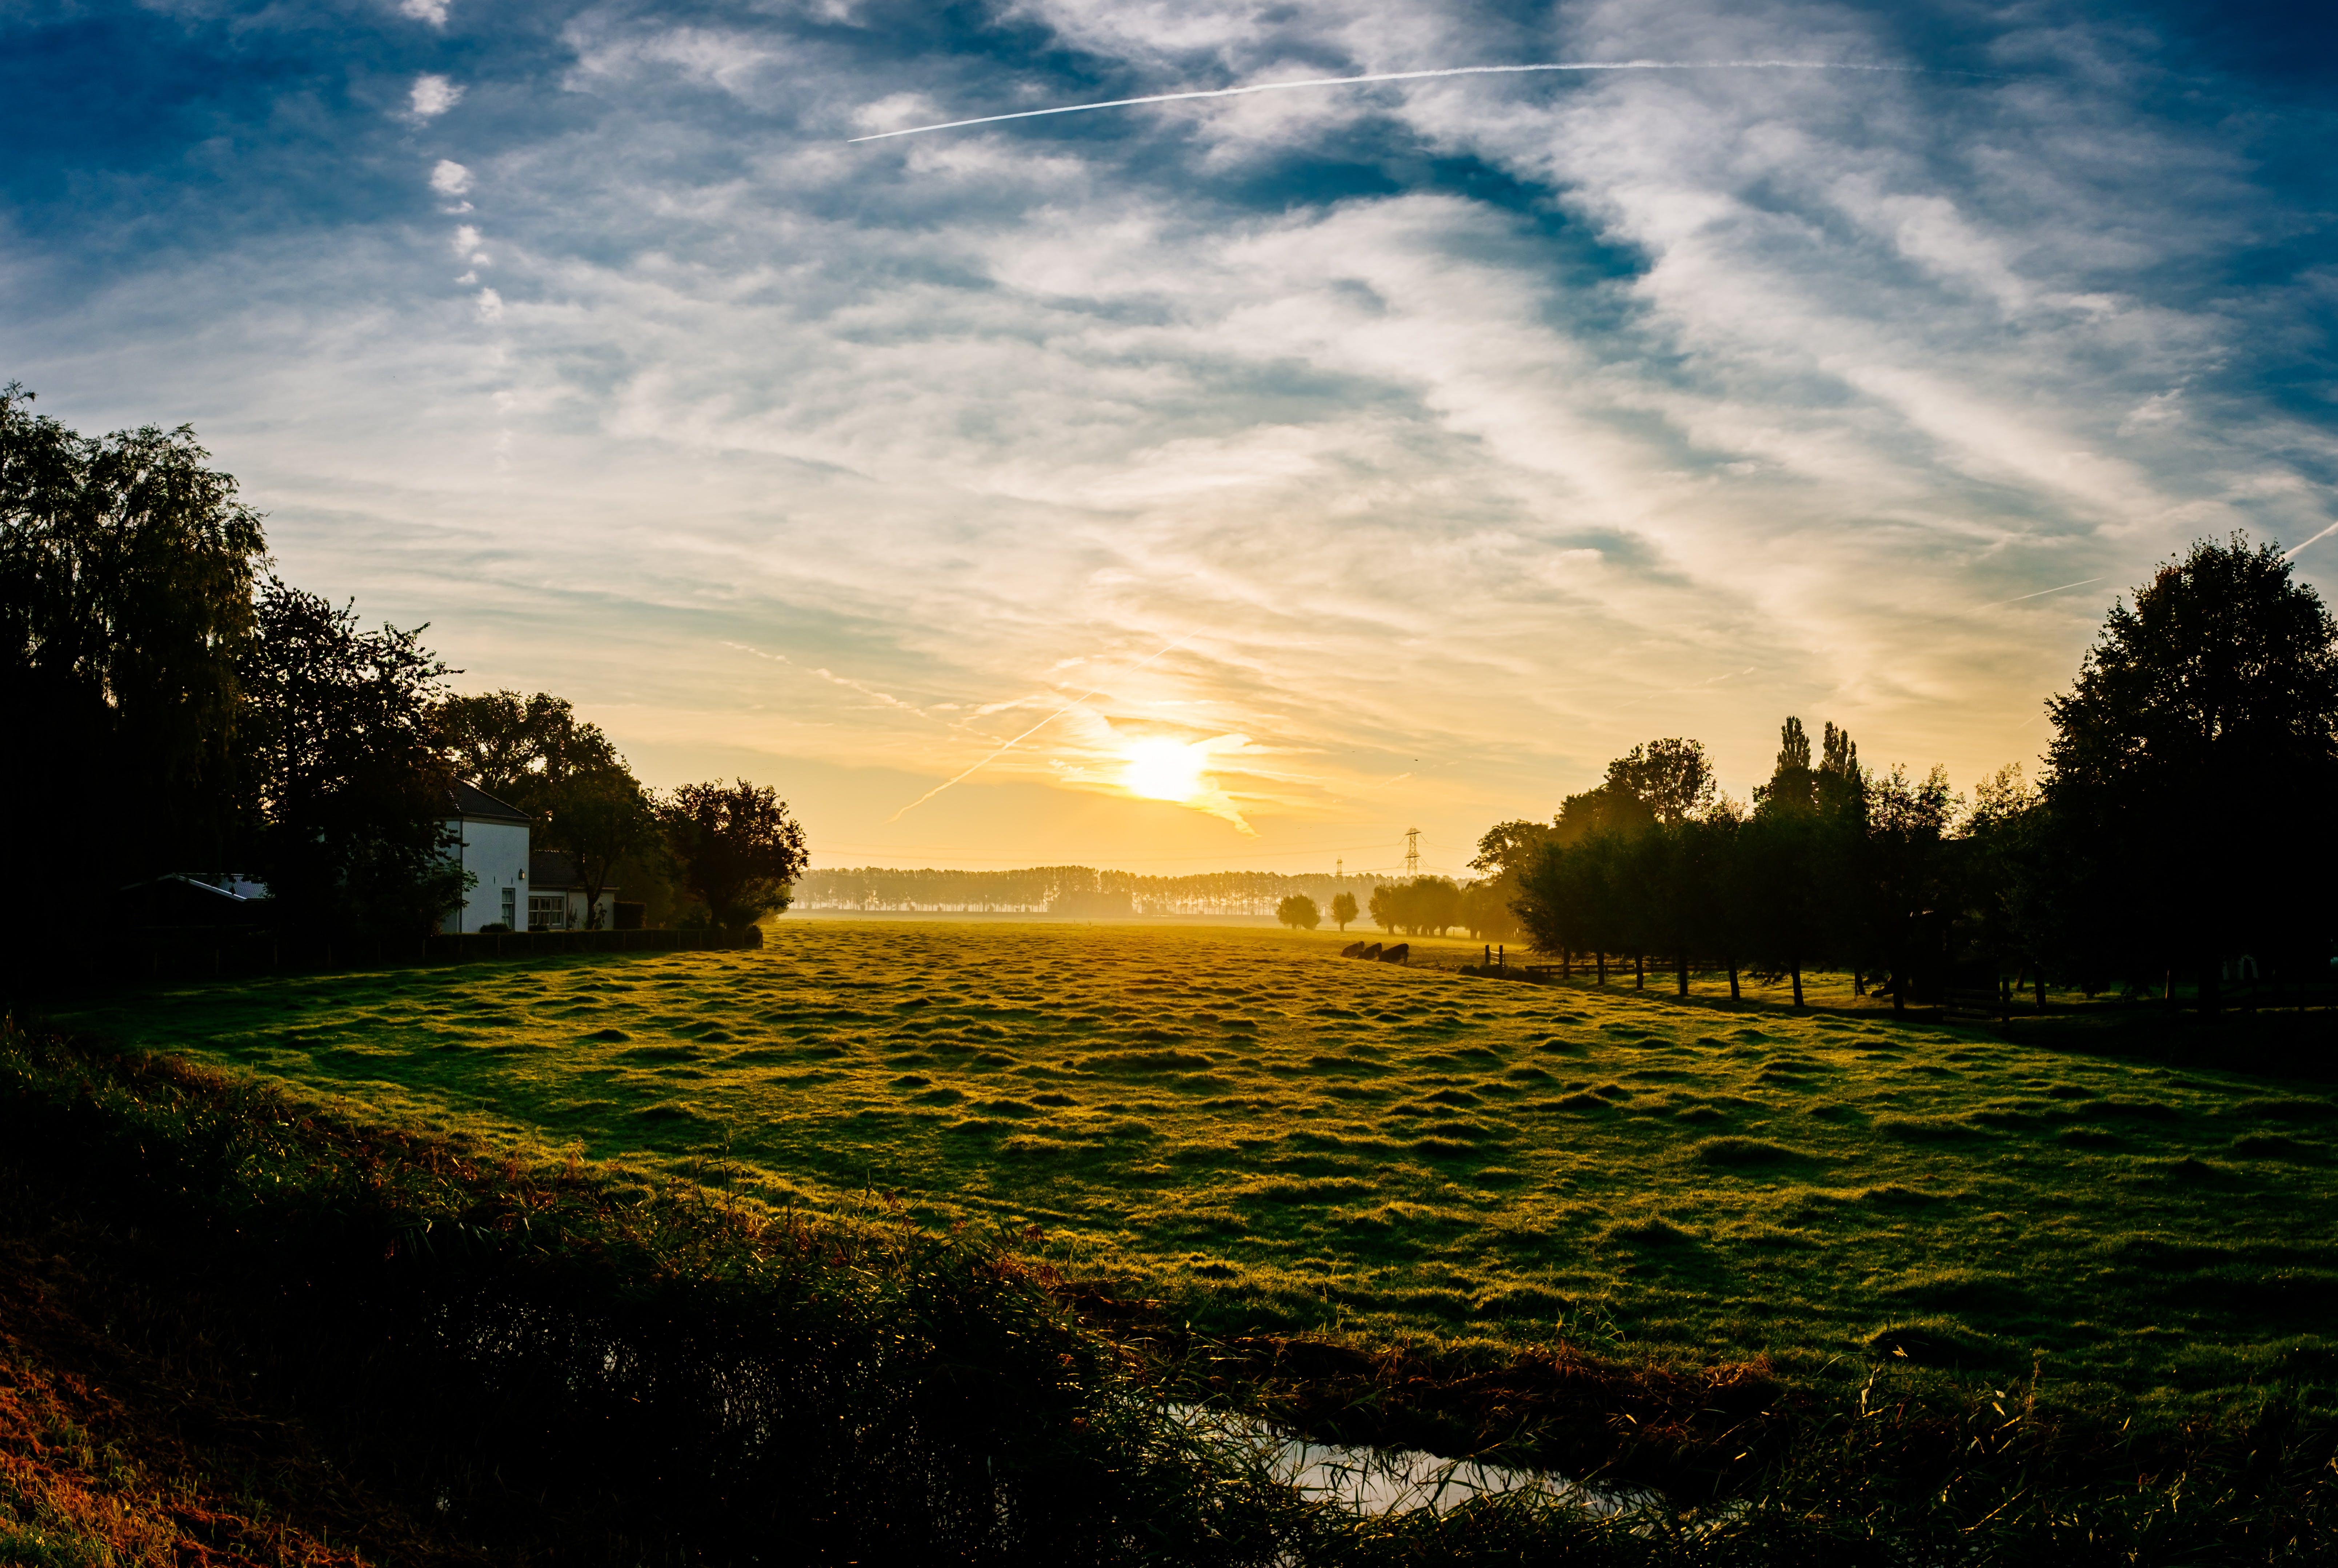 Kostenloses Stock Foto zu landschaft, natur, sonnenaufgang, sonnenuntergang